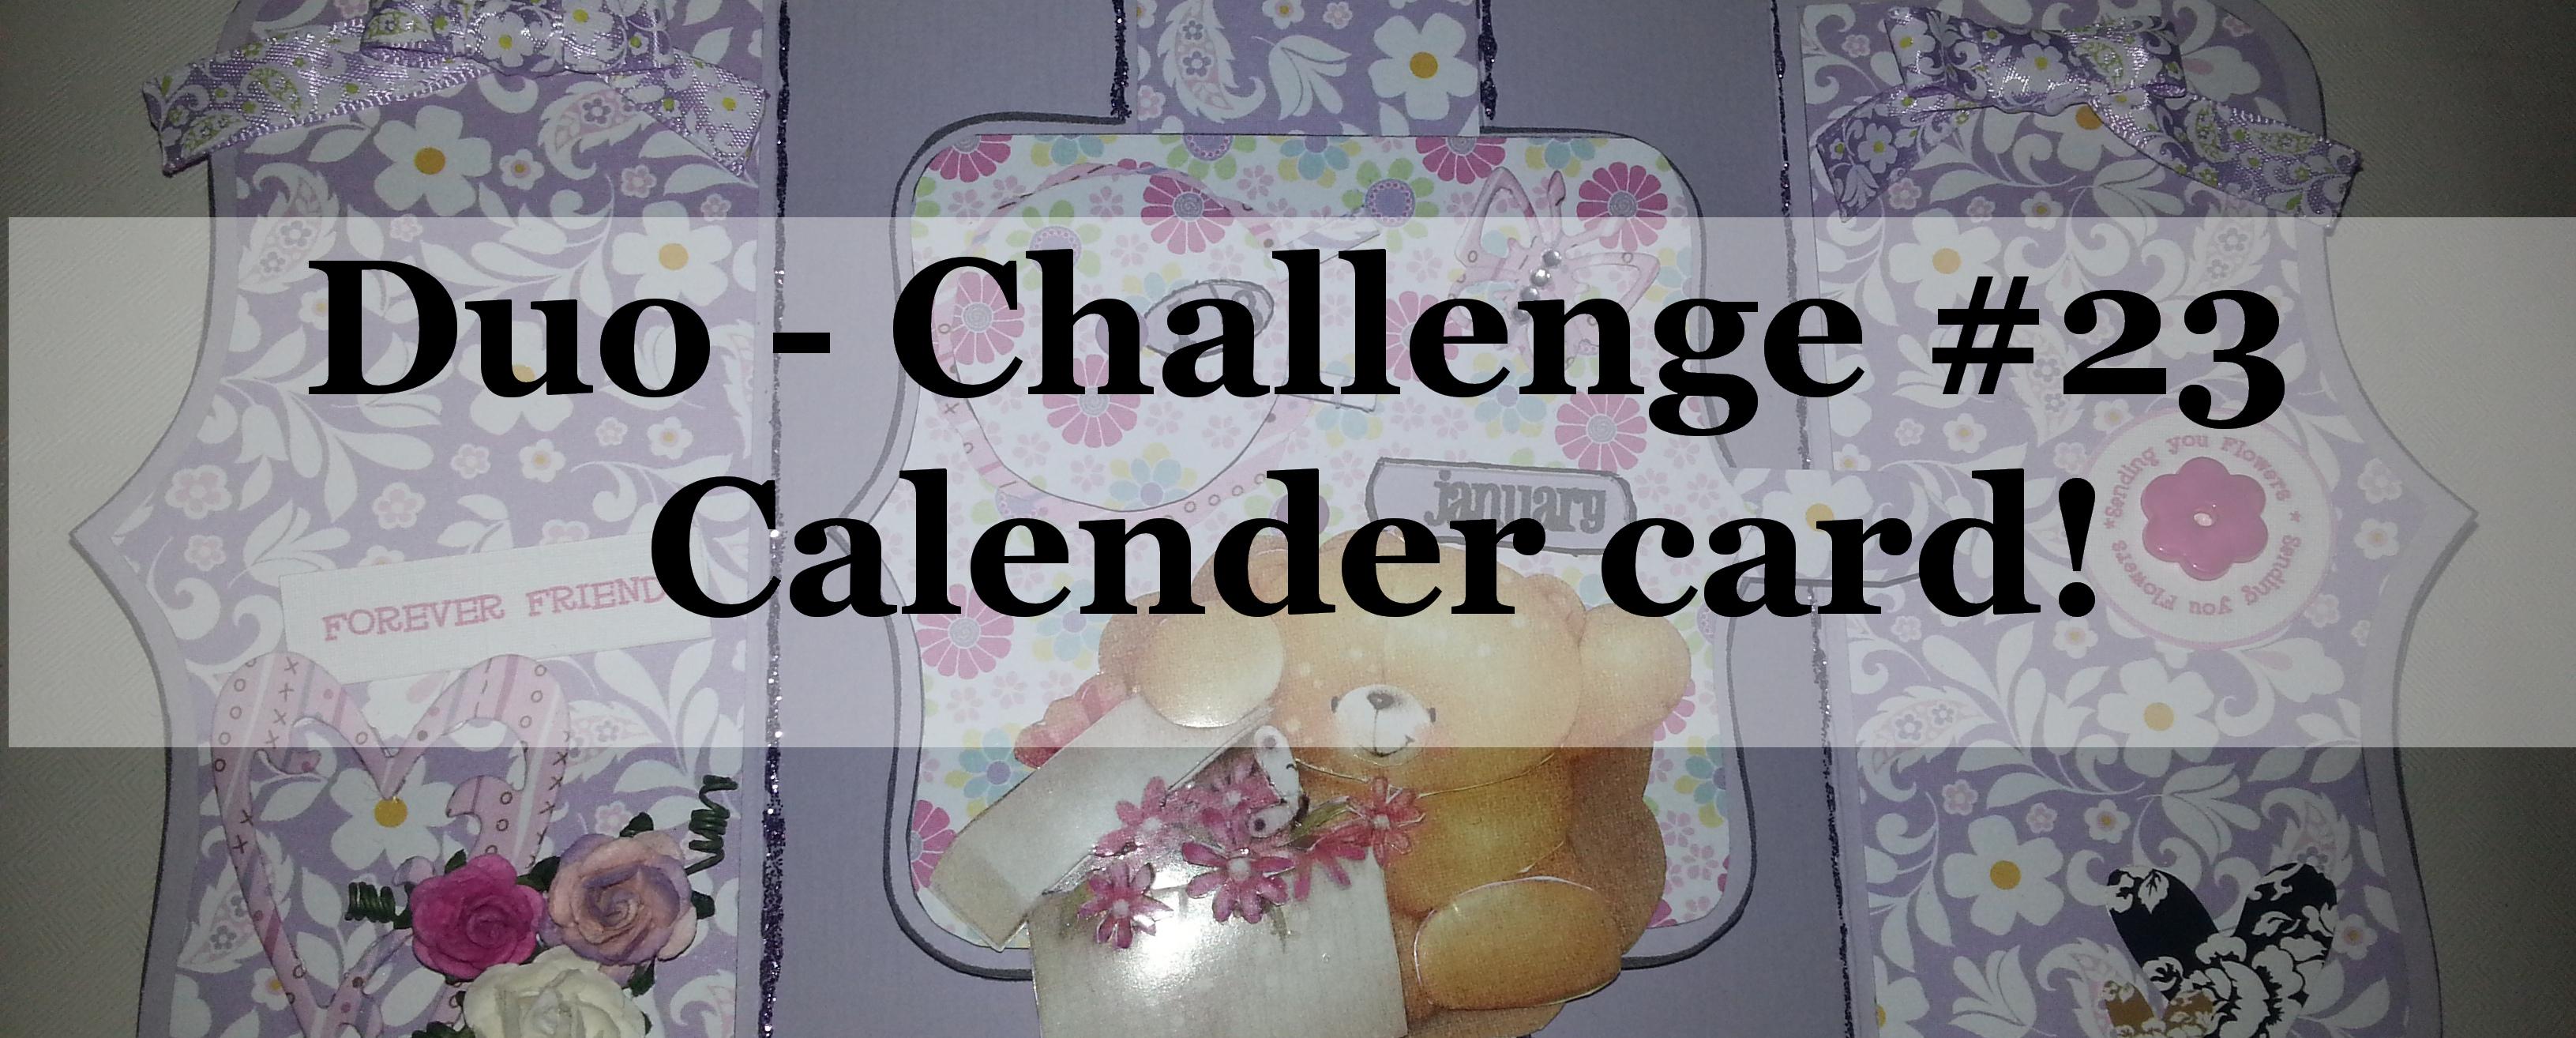 calder card